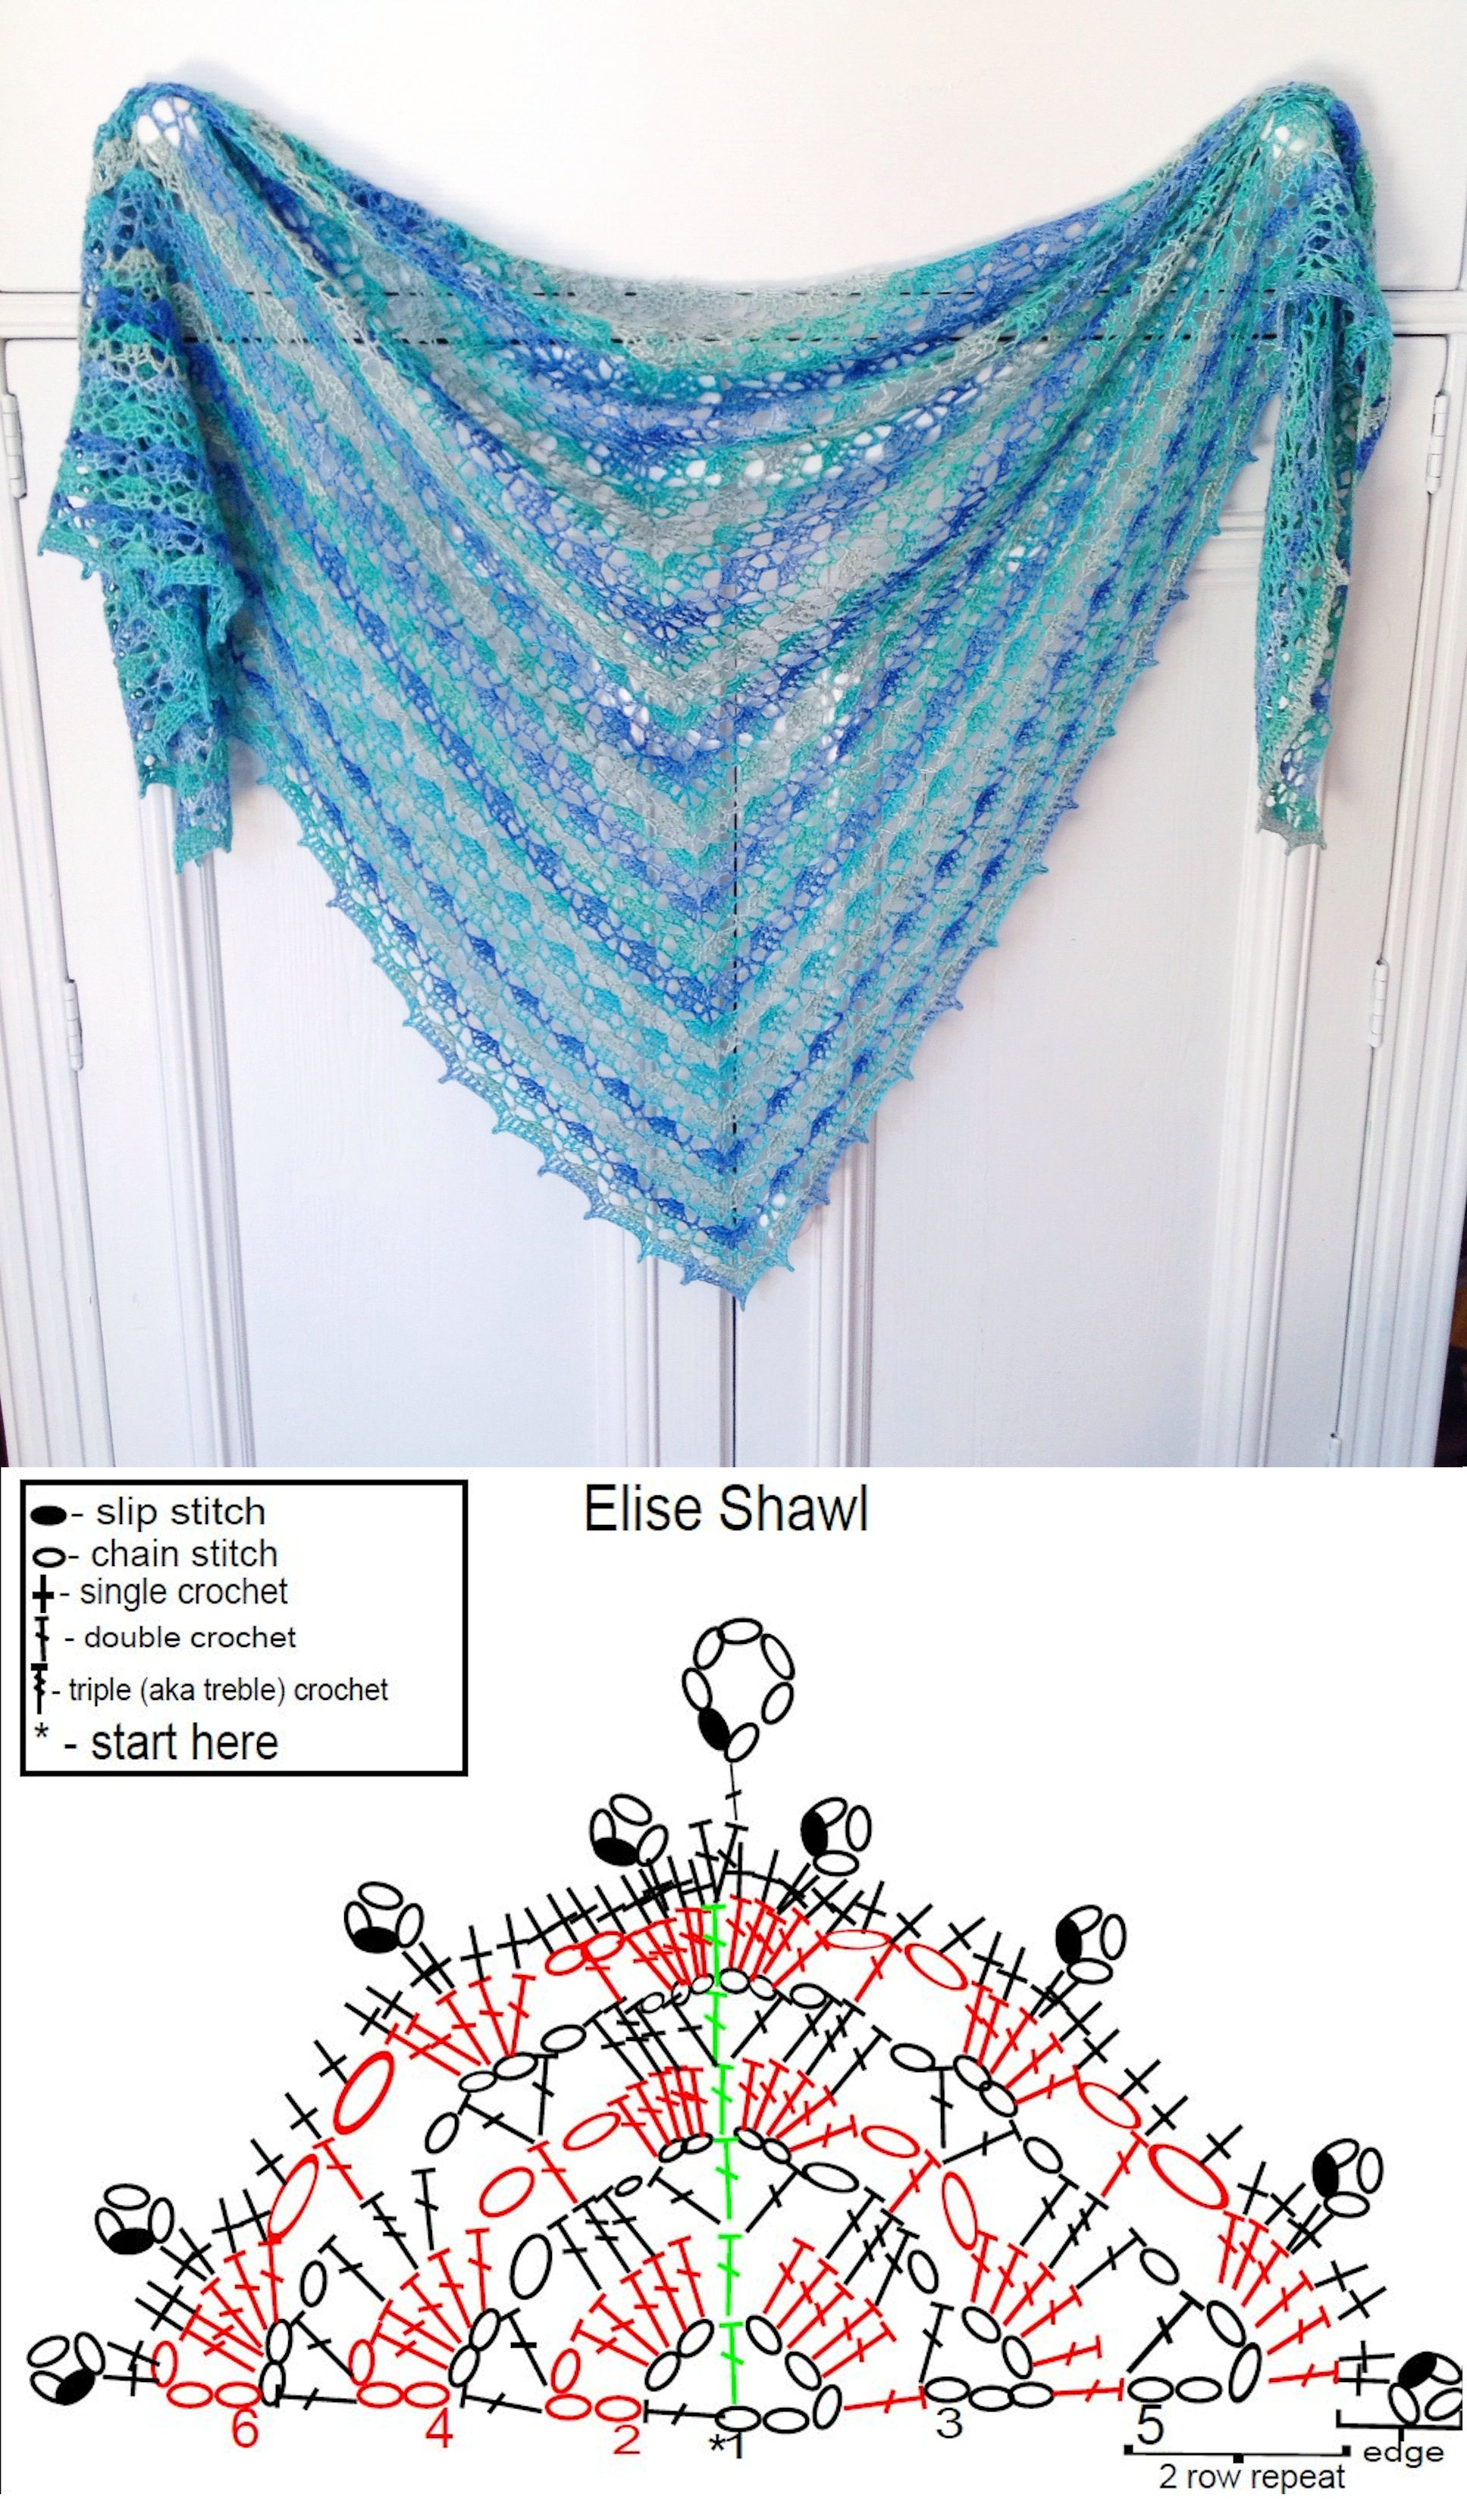 Crochet Elise Shawl | Jólaföndur | Pinterest | Chal, Ganchillo y Ponchos